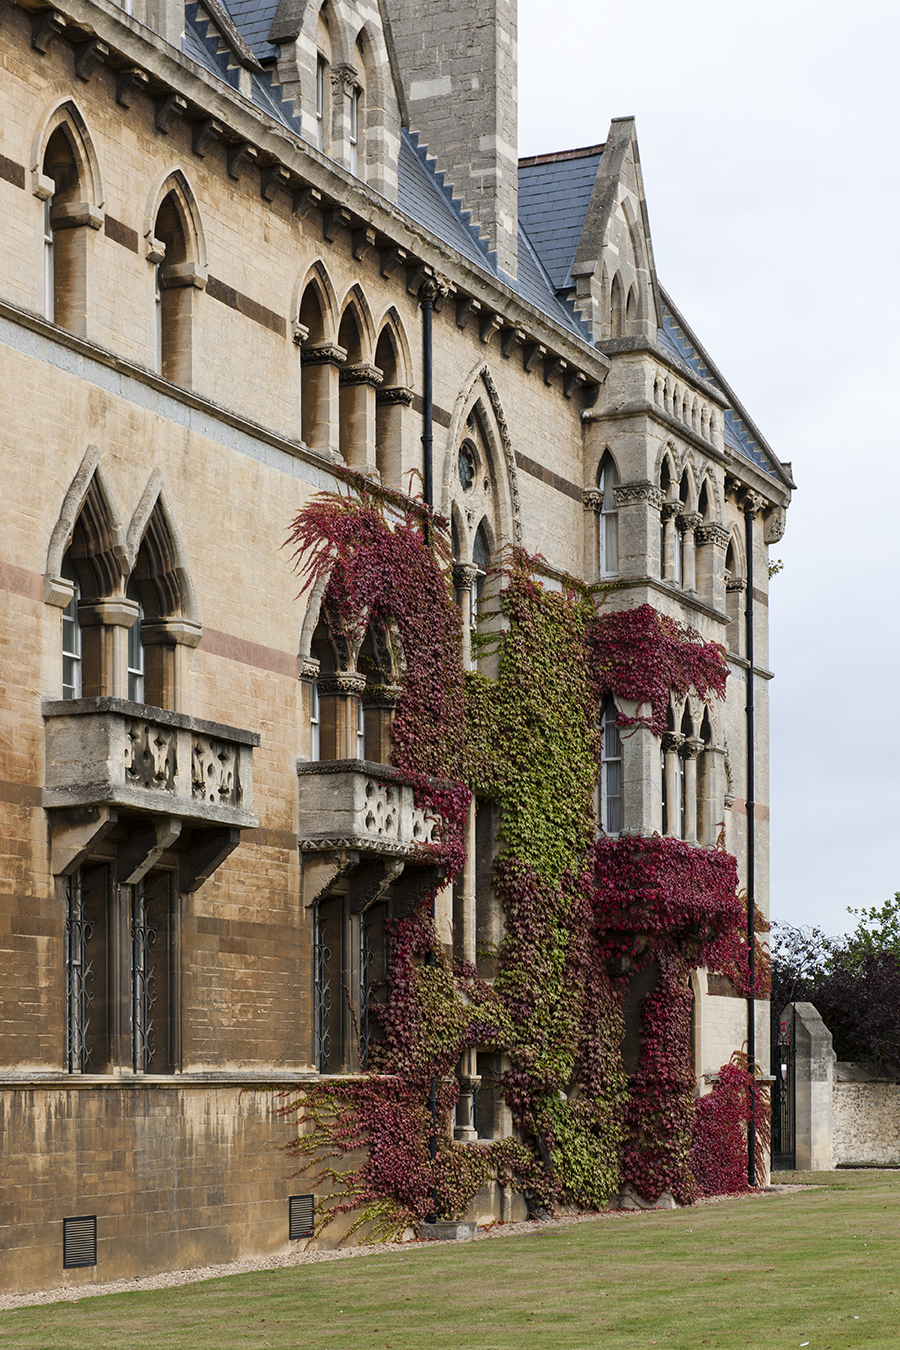 The Architecture of Oxford No. 4